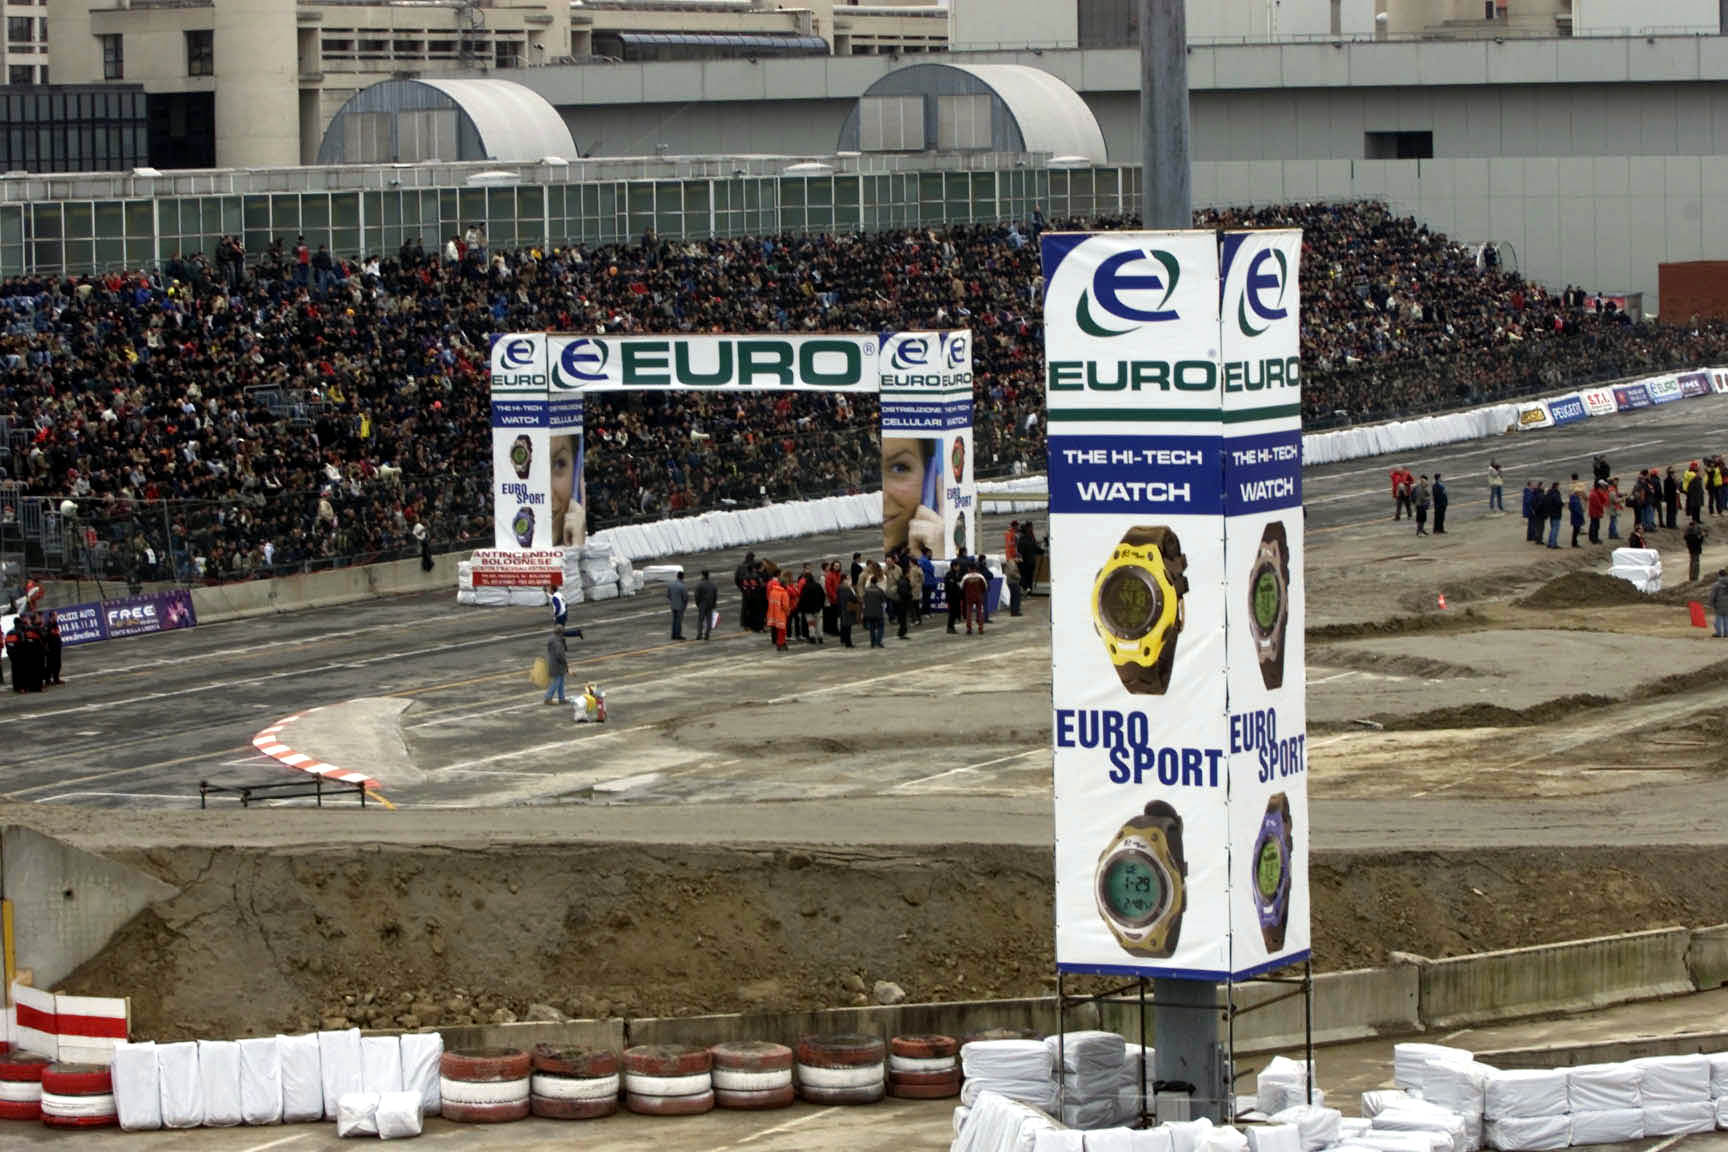 Euro sponsorship rtr sports marketing